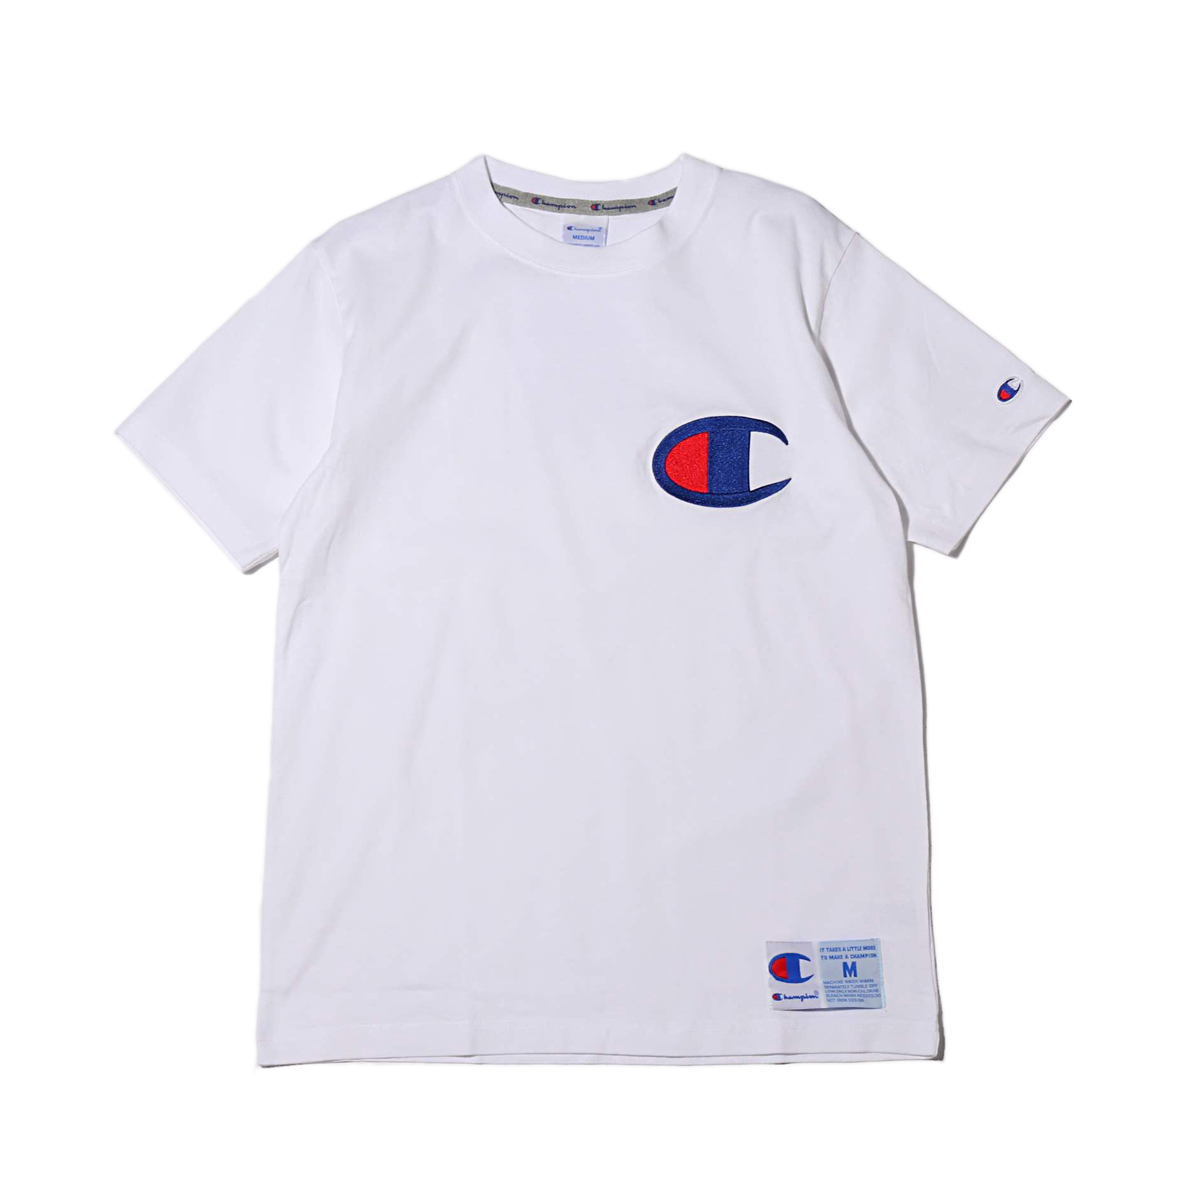 dd981050 Kinetics: Champion T-SHIRT (WHITE) (champion T-shirt) | Rakuten ...